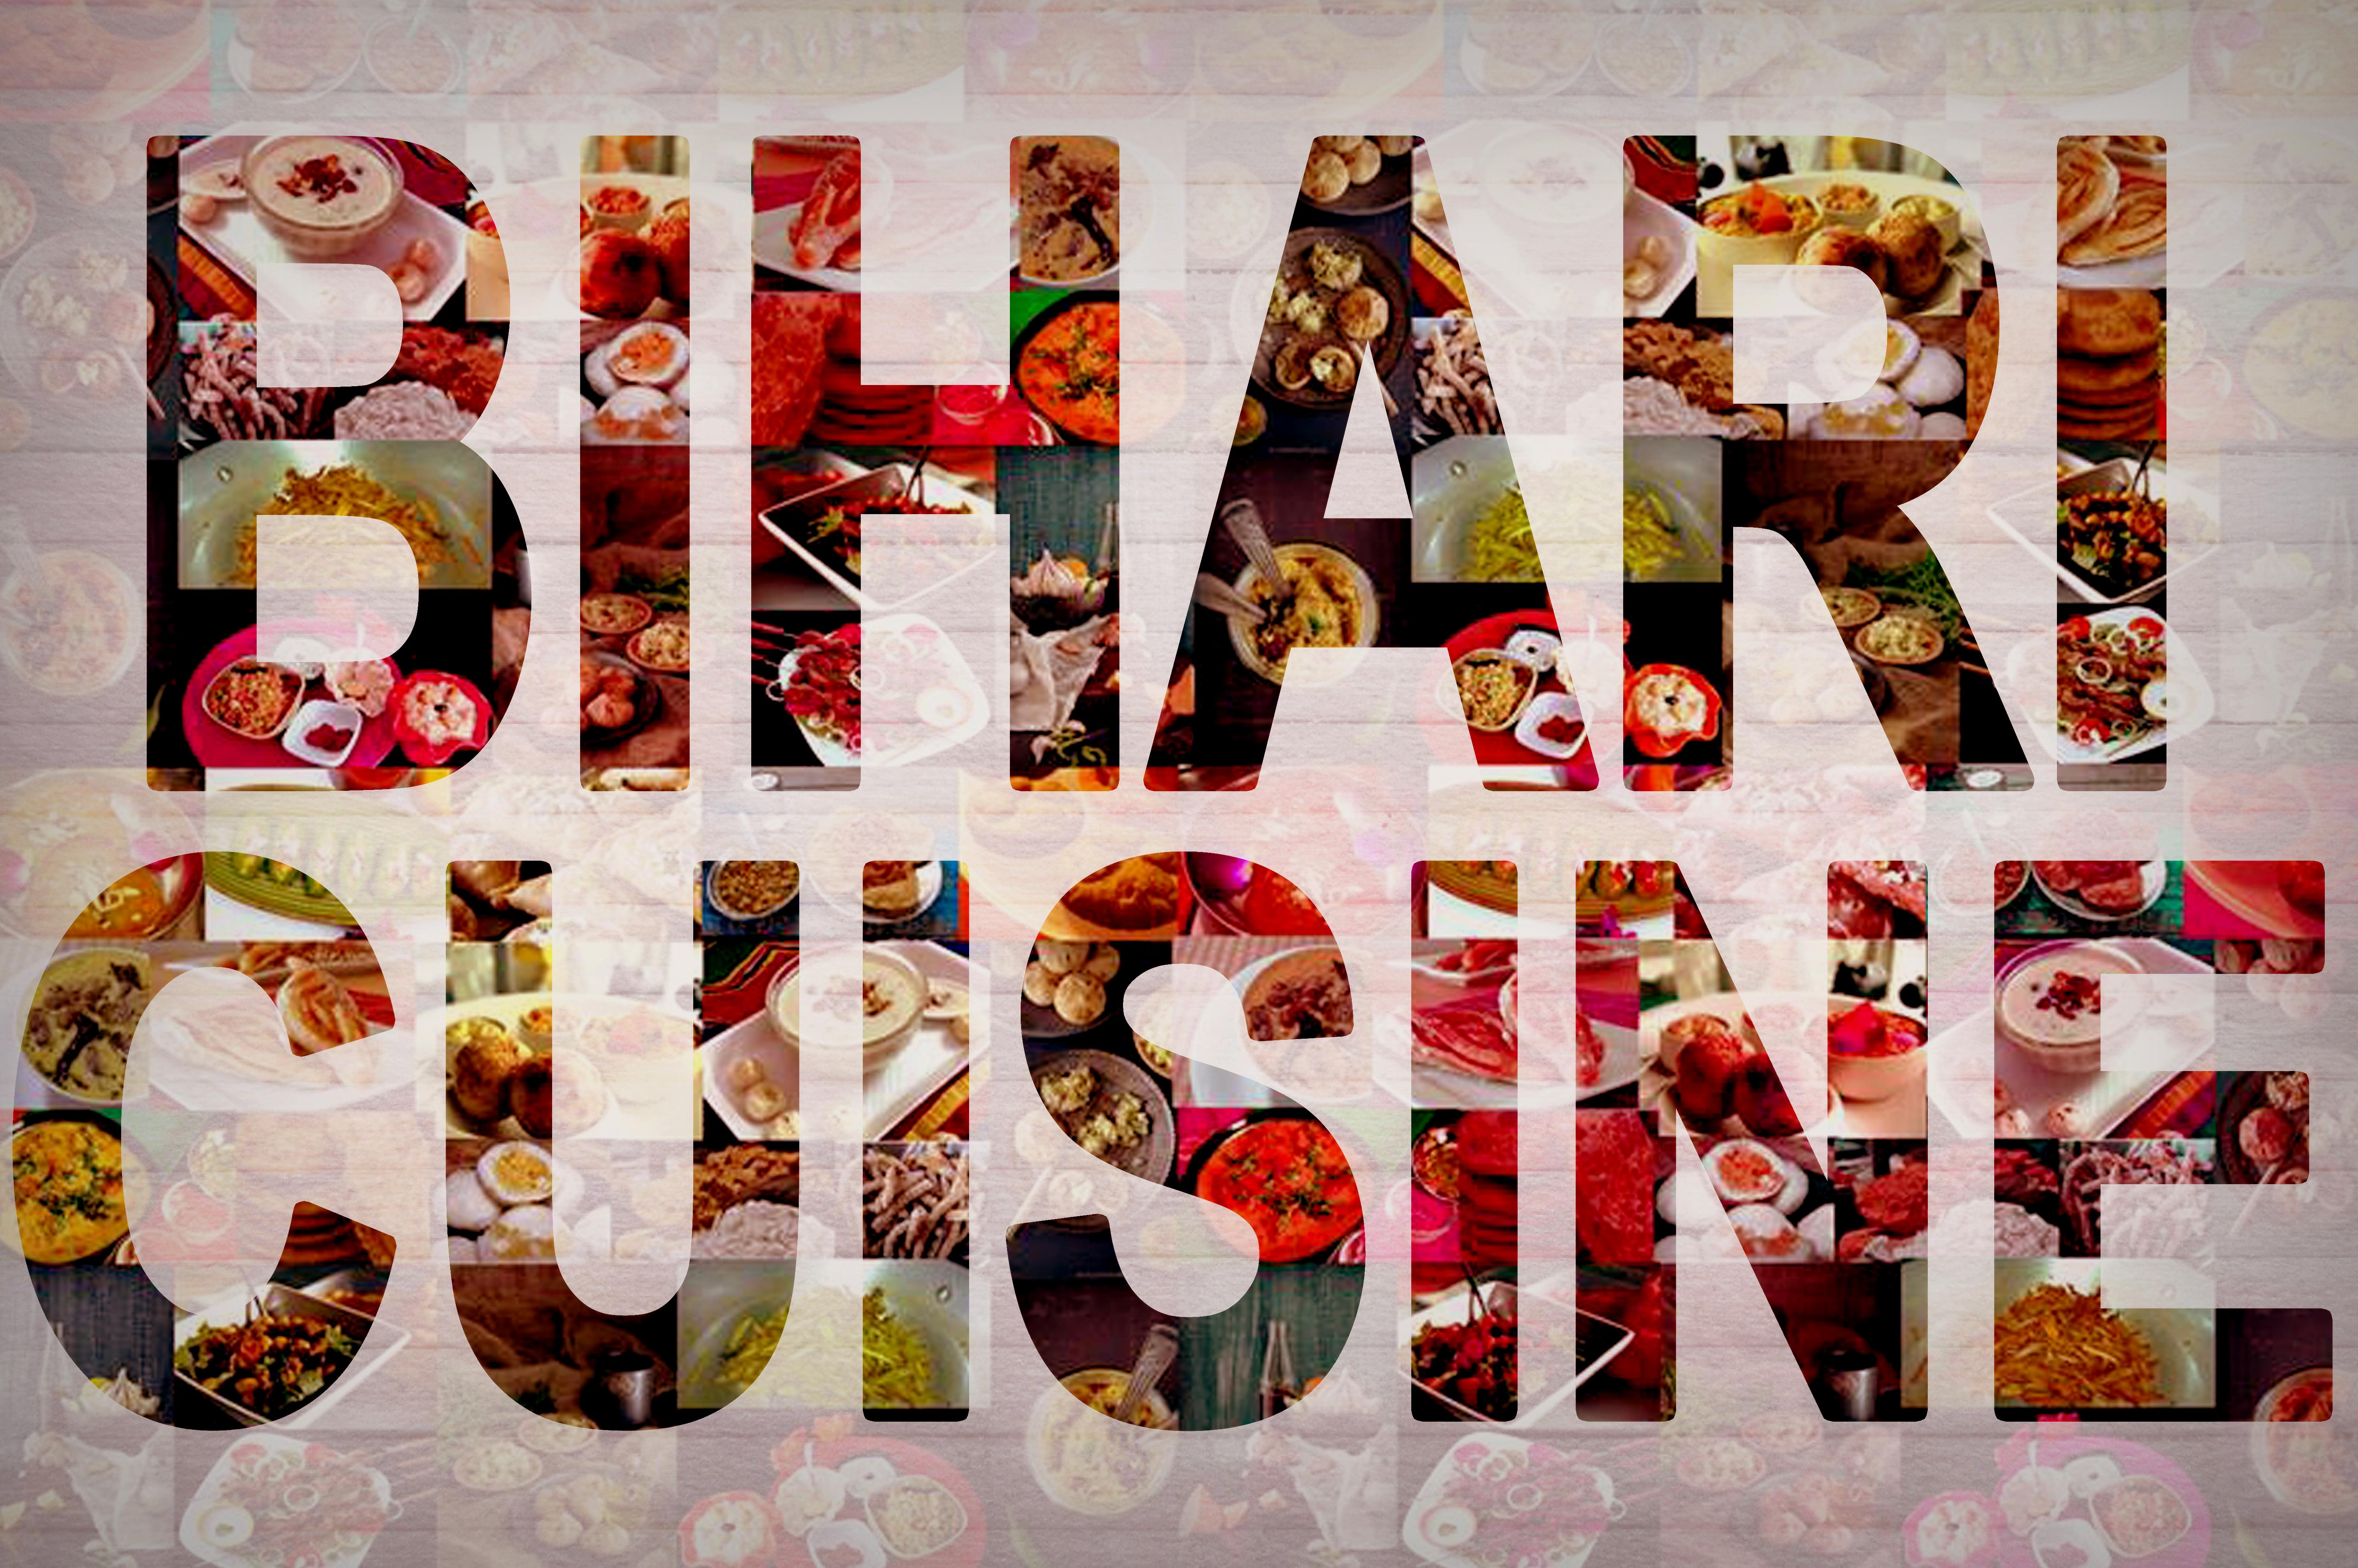 Bihari cuisine, Bihari Dishes, Bihari food, Foof from Bihar